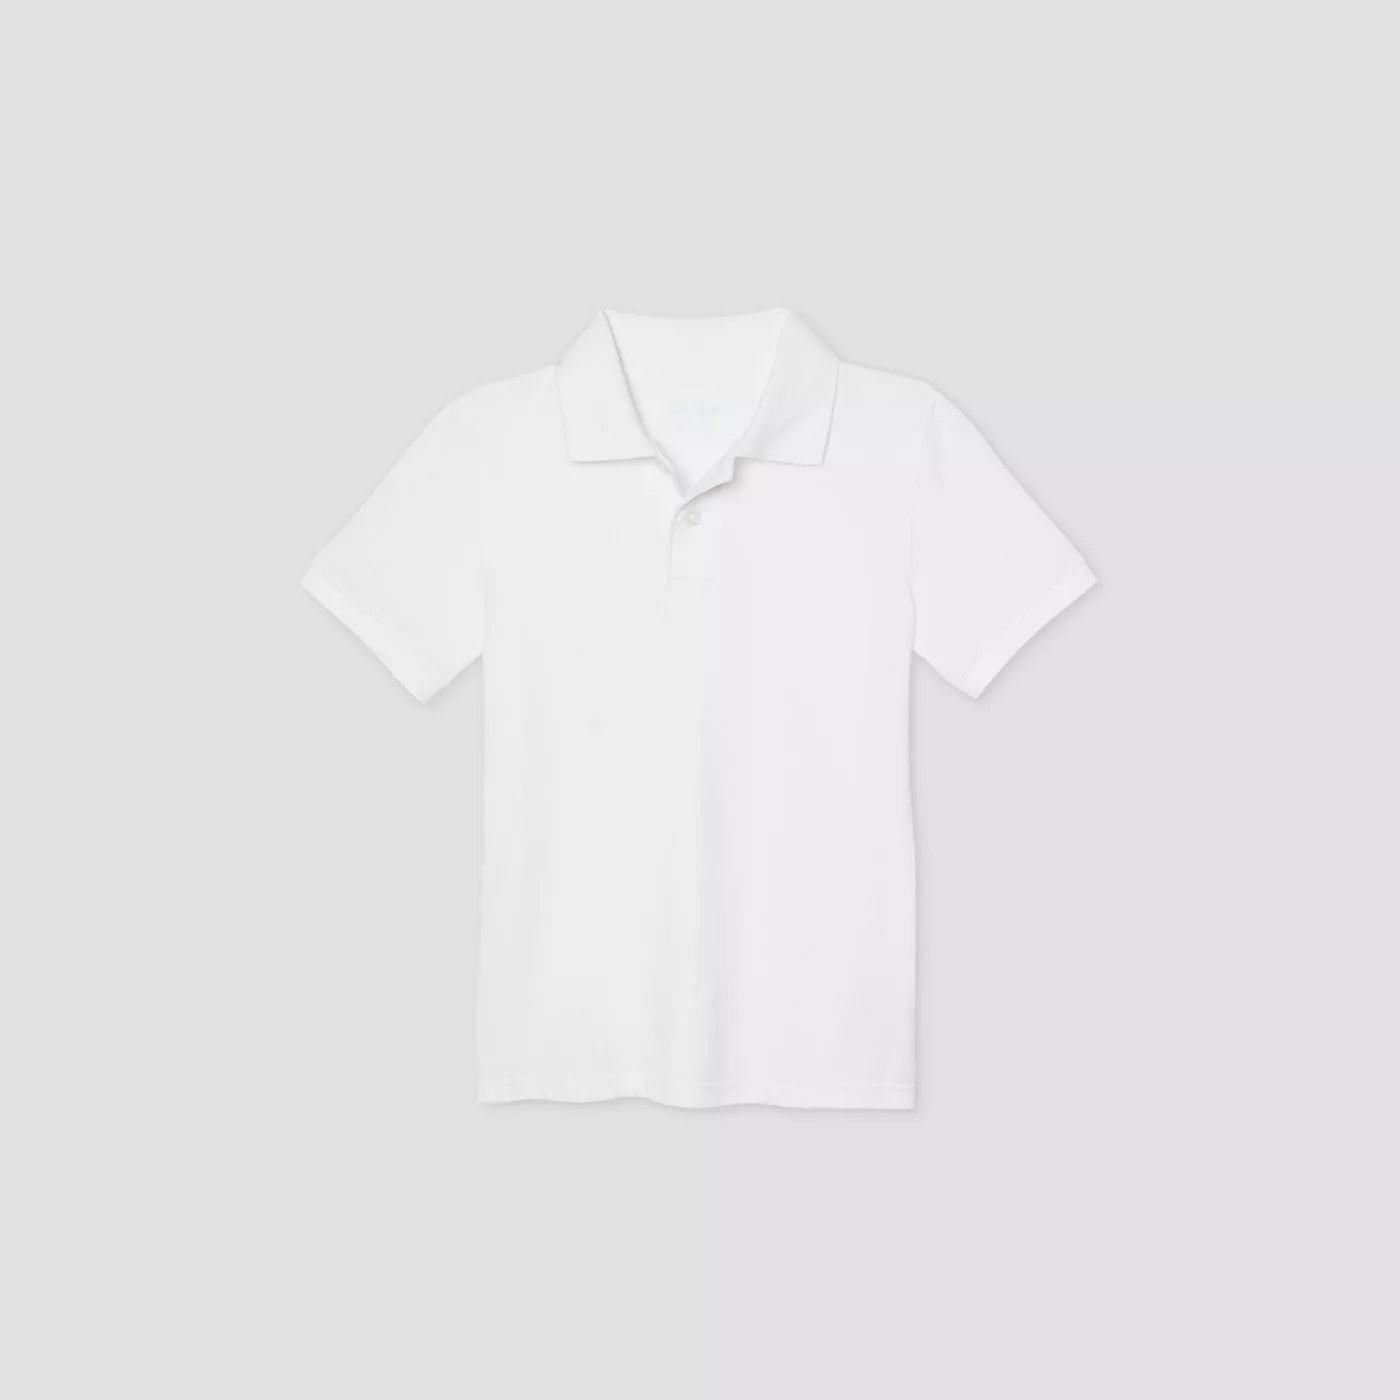 The white collared shirt